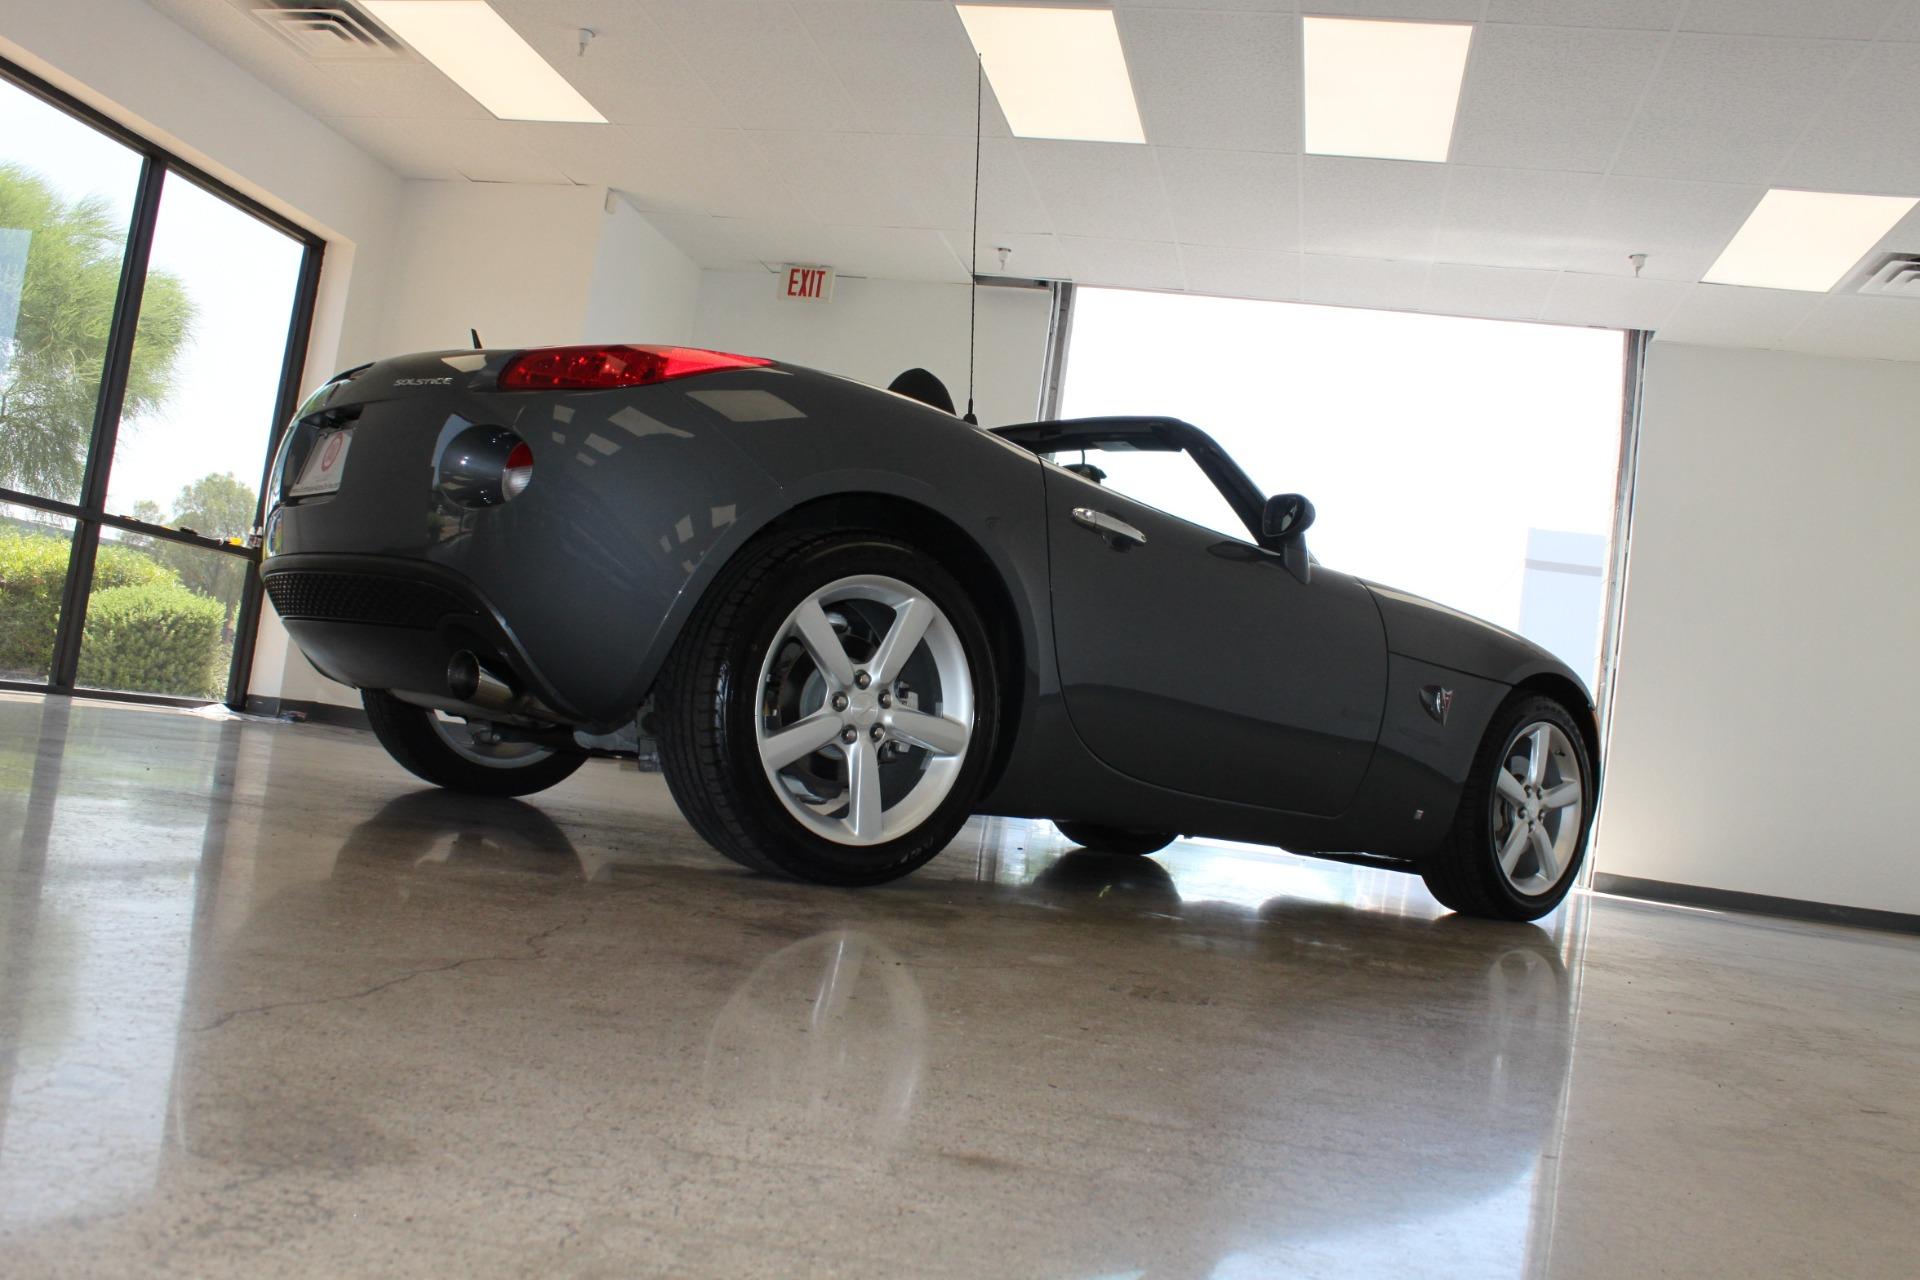 Used-2009-Pontiac-Solstice-Convertible-XJ